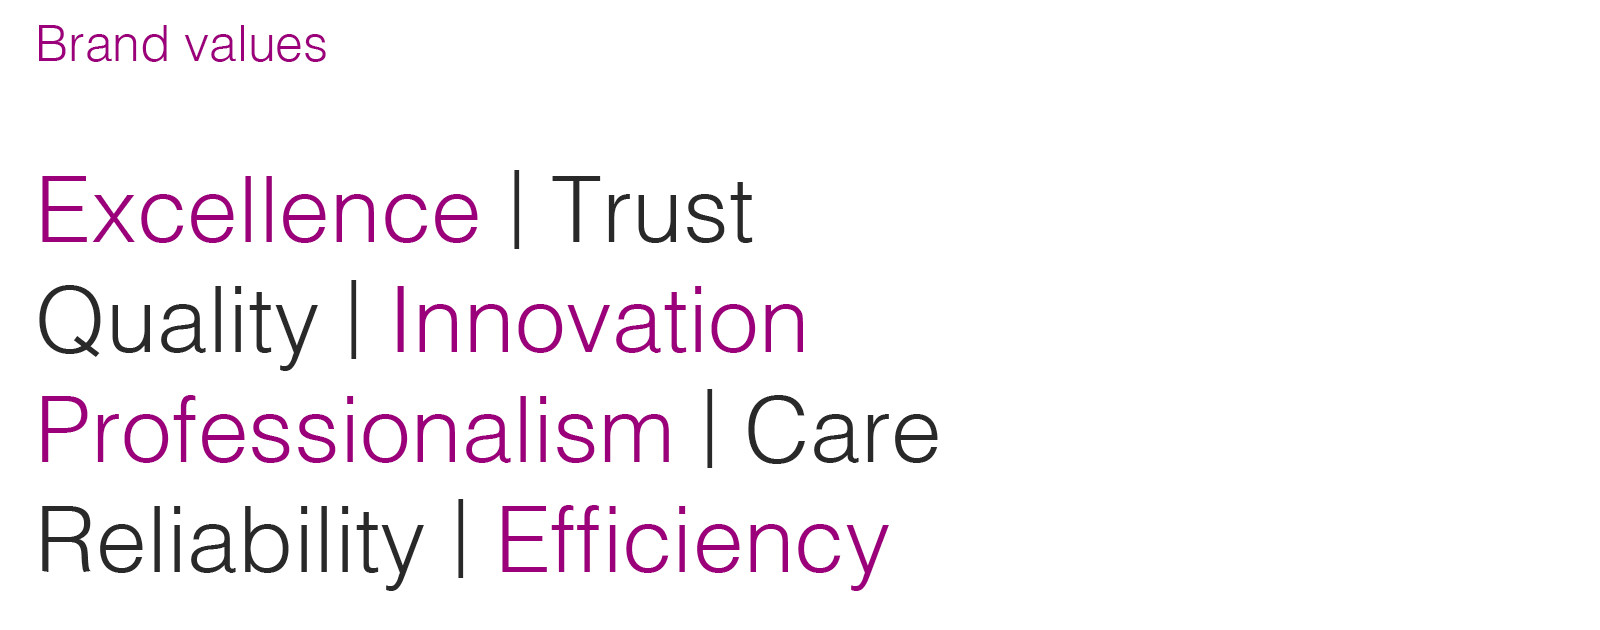 Medical-equipment-logo-brand-identity-strategy-mission-values